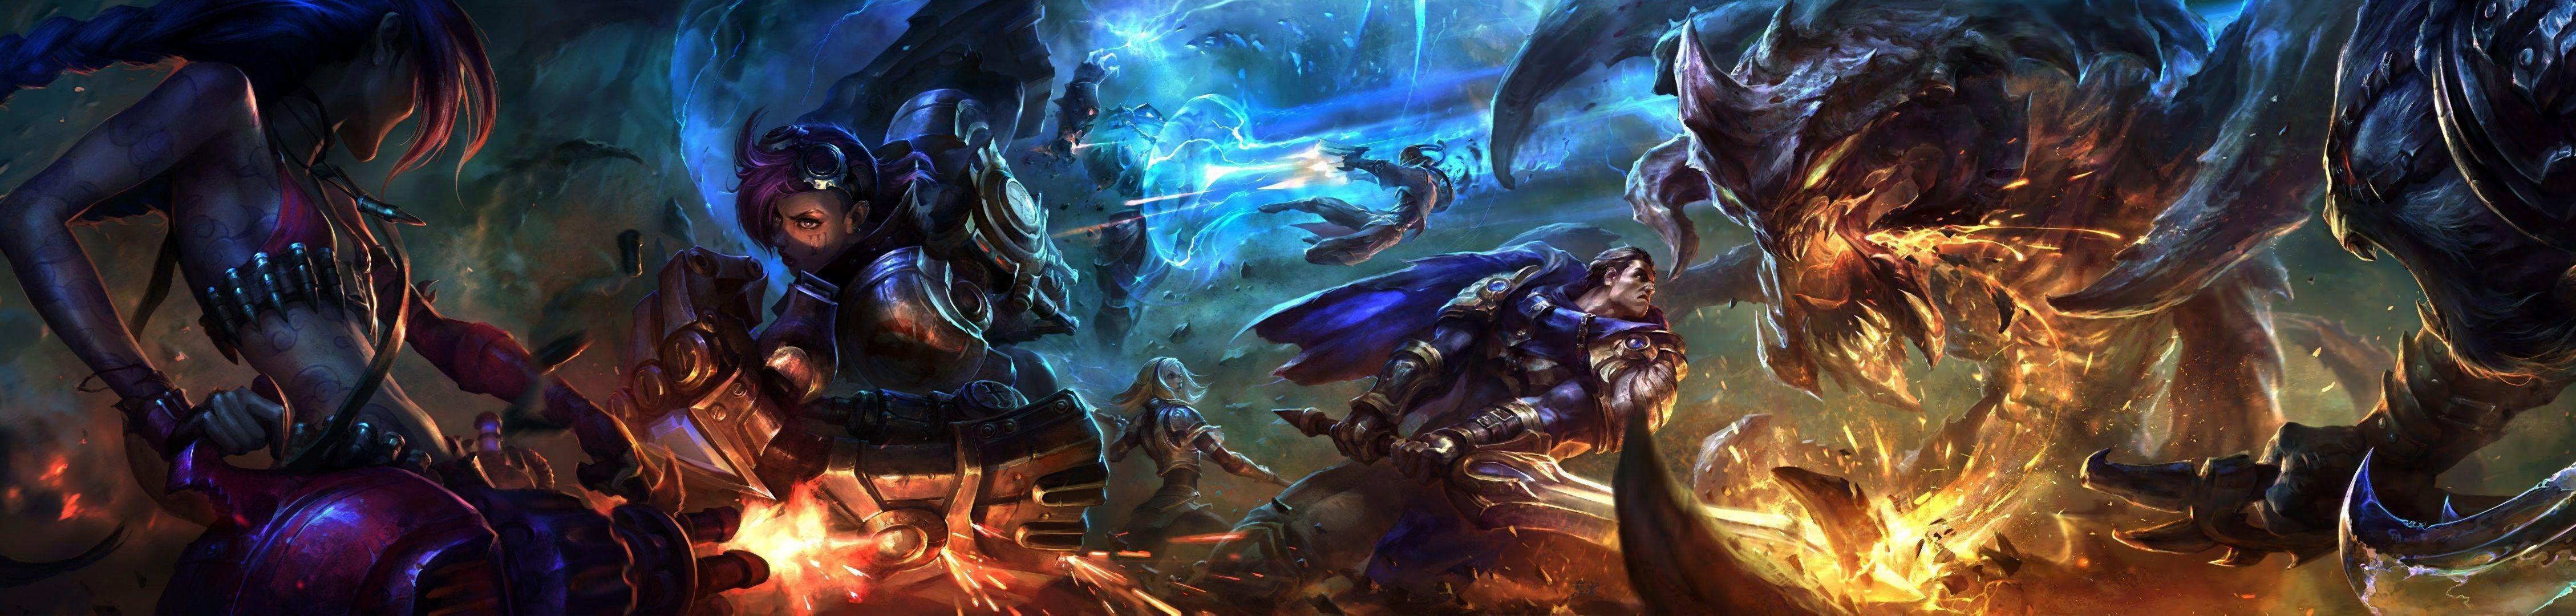 League Of Legends Dual Screen Wallpapers Top Free League